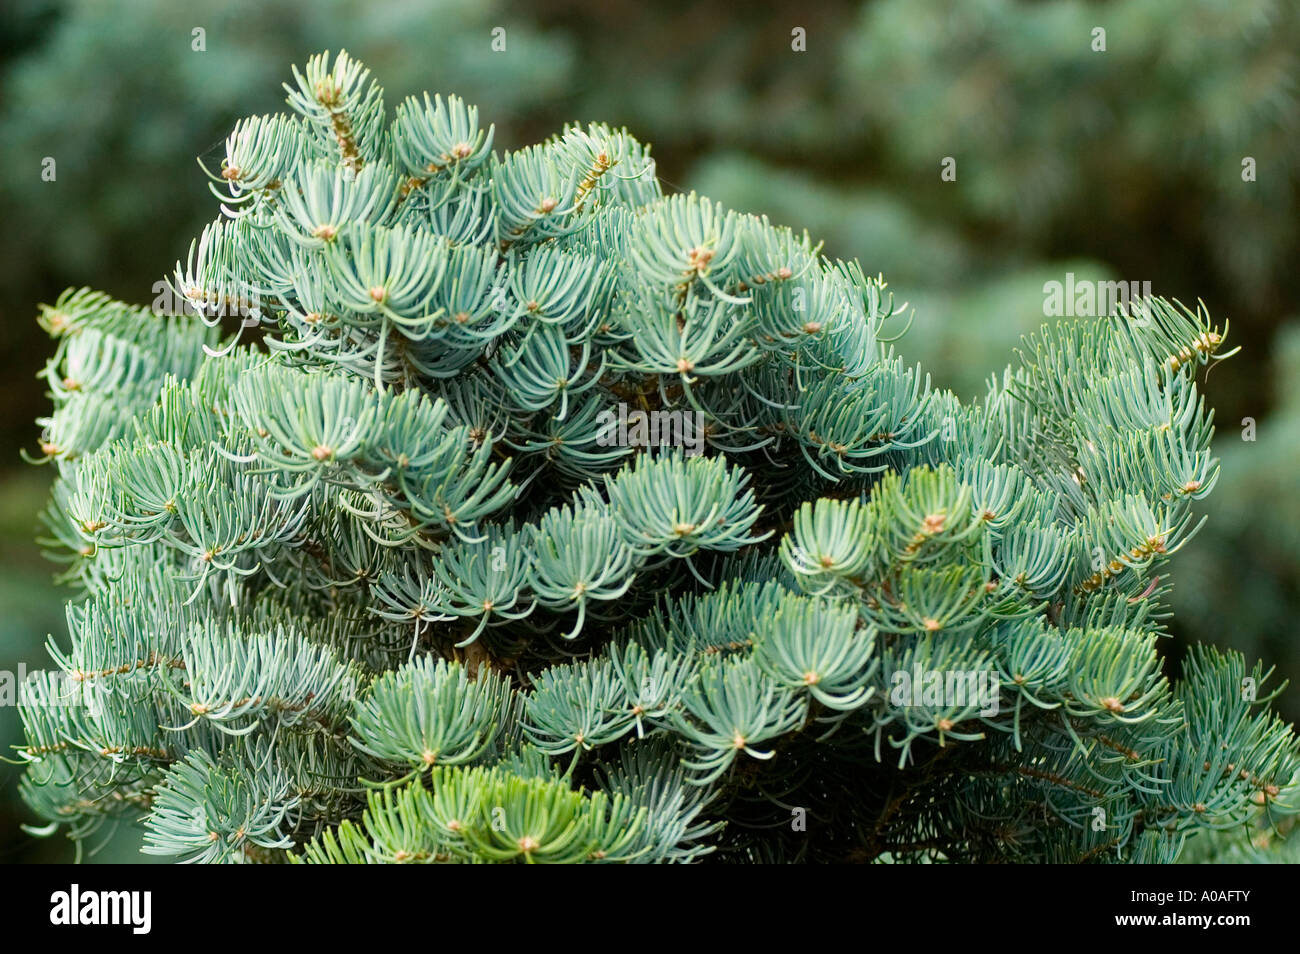 White Fir Pinaceae Abies Concolor Var Compacta Stock Photo 9933914